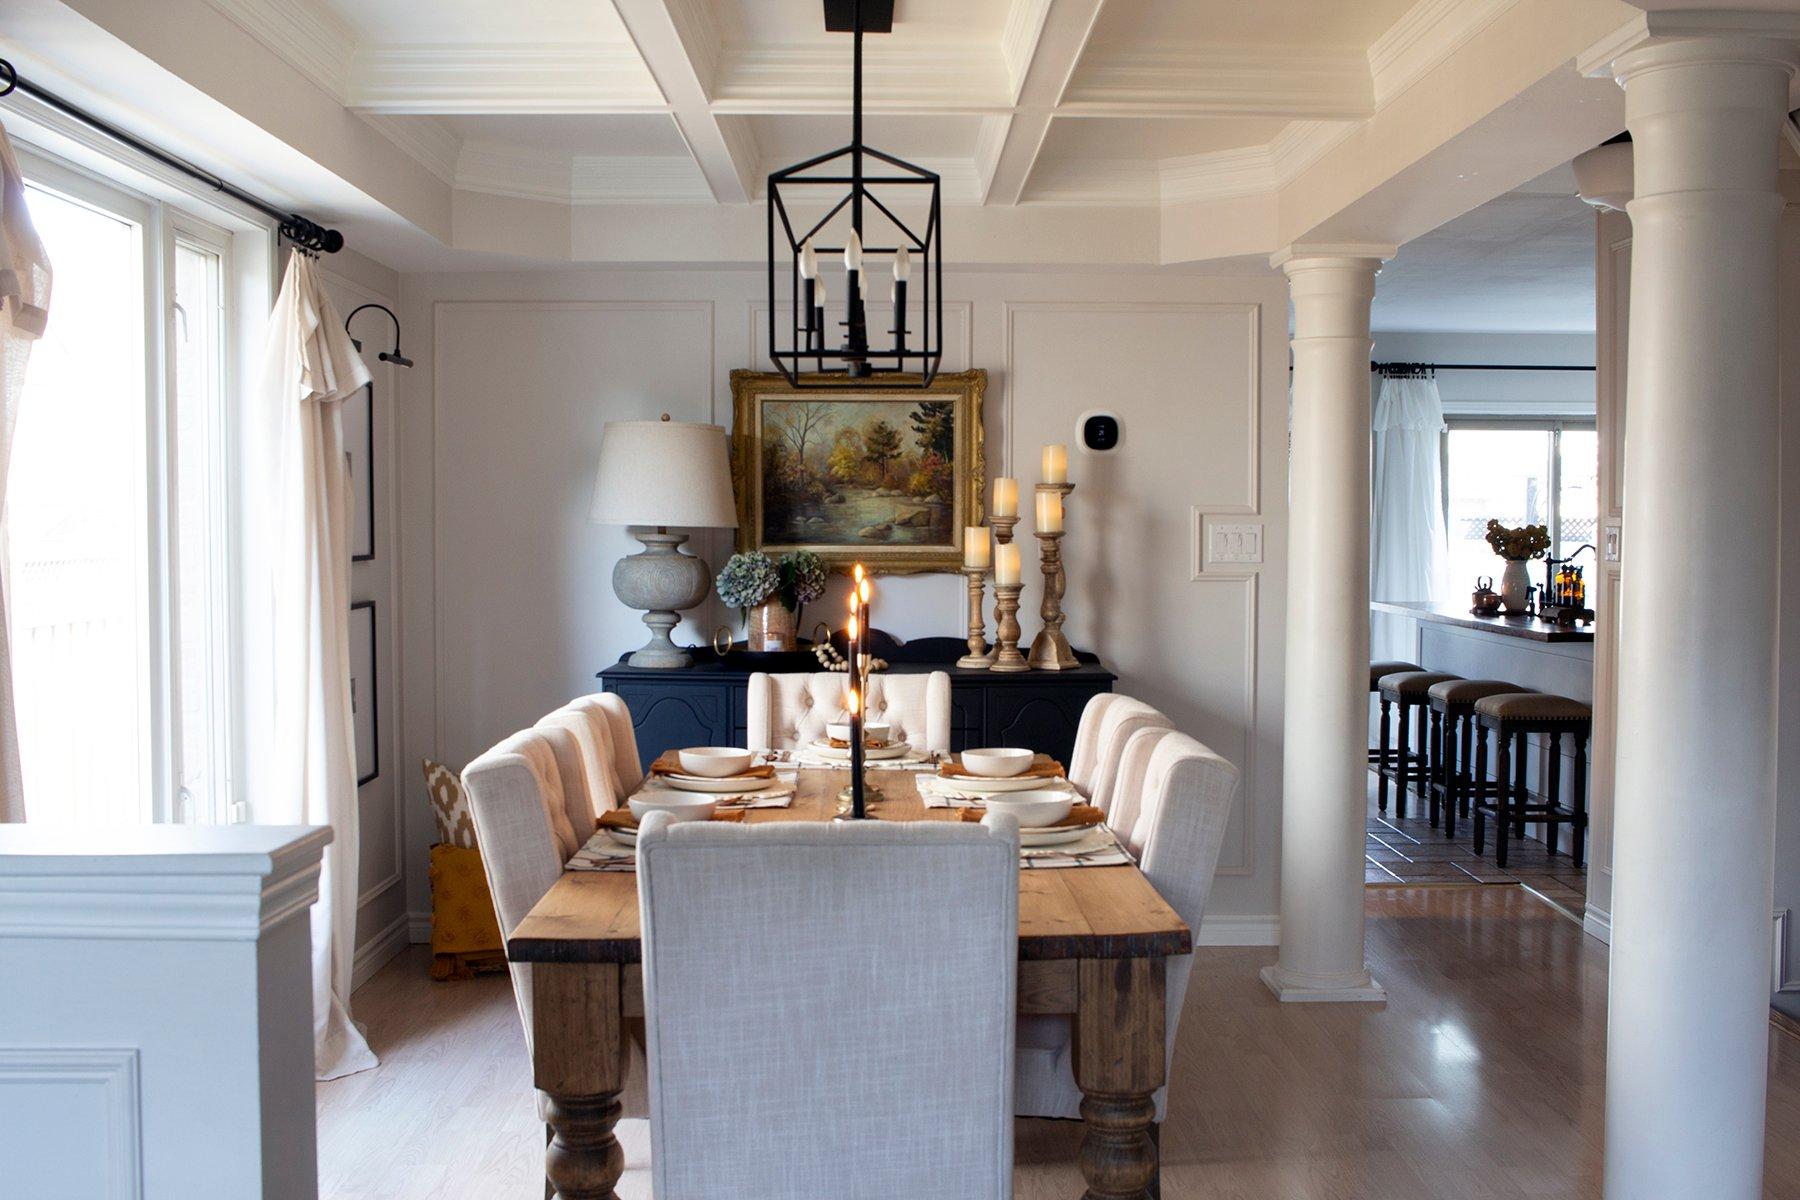 cozy warm dining room